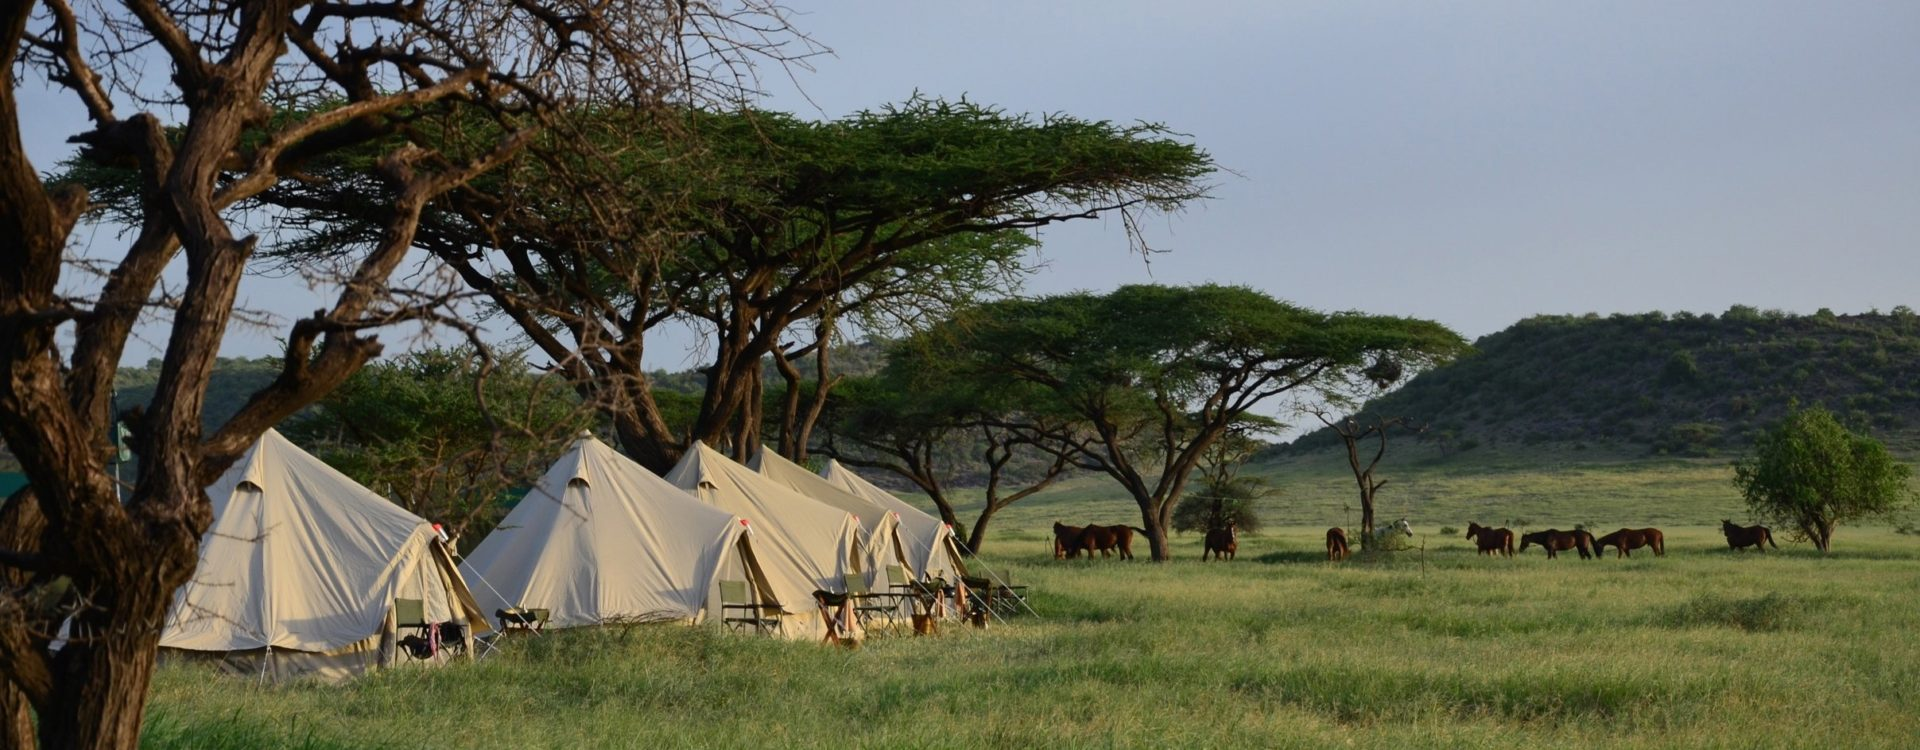 Riding Safari across the Serengeti - Tanzania